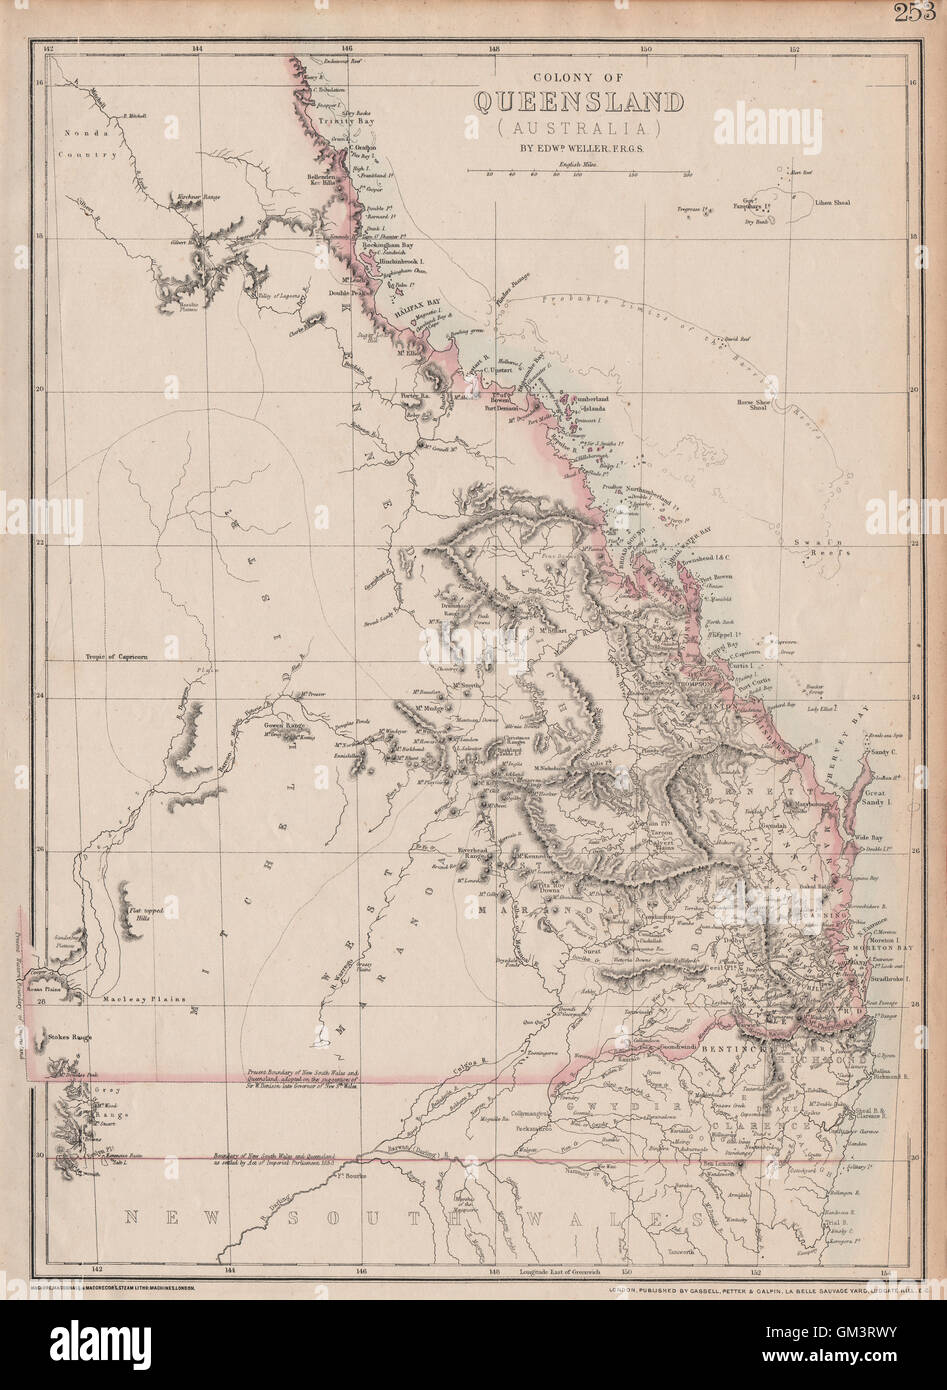 Australia Map 1850.Colony Of Queensland Australia Current 1850 Nsw Border Stock